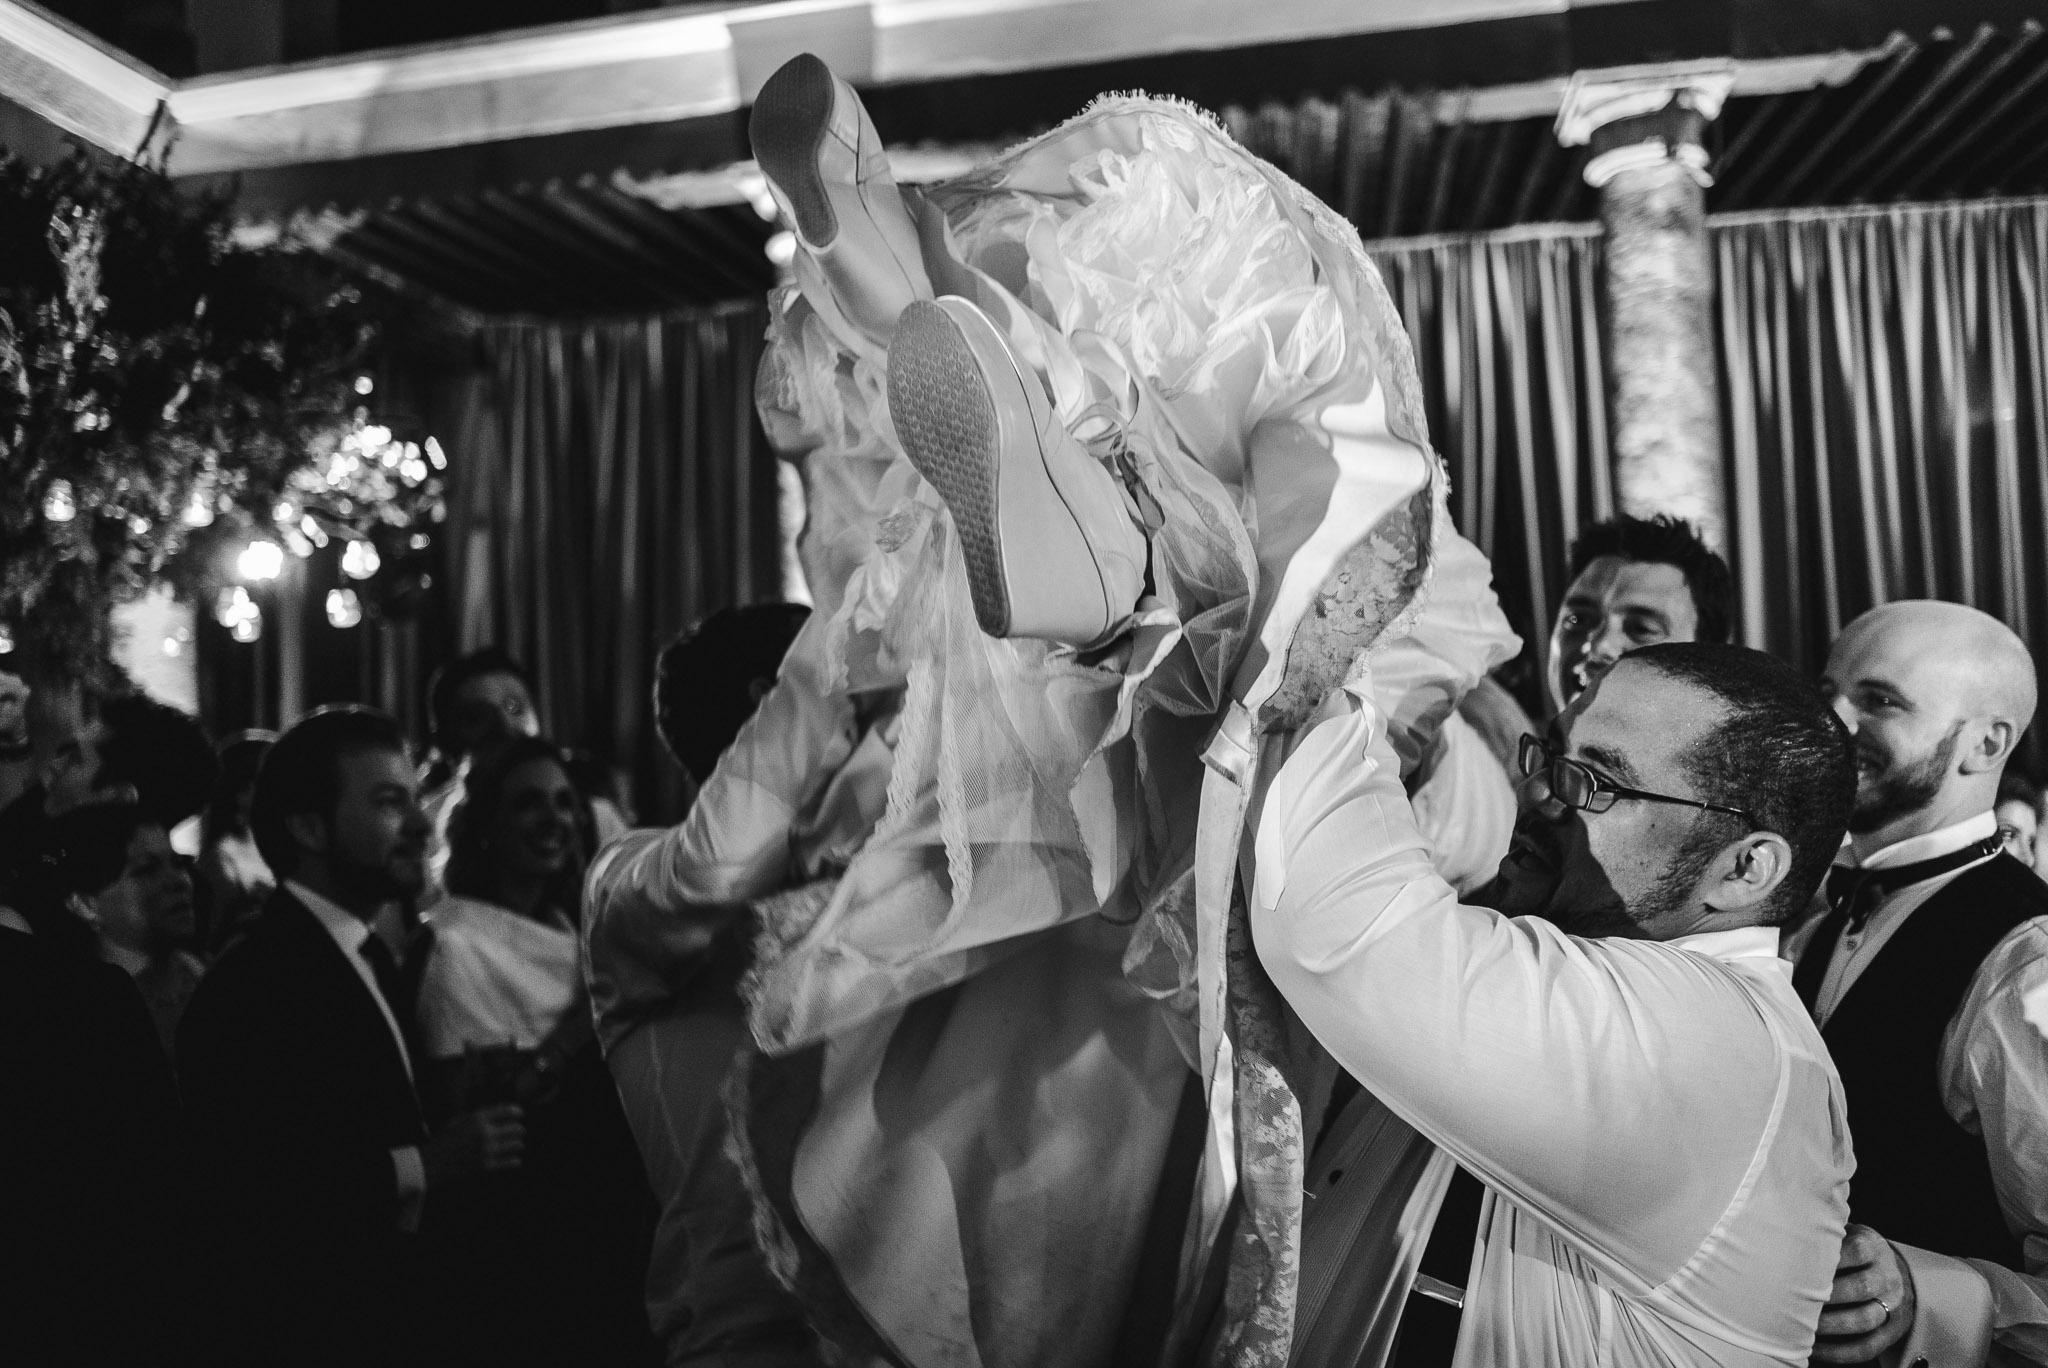 ©www.mauriziosolisbroca.com-20161002maurizio-solis-broca-mexico-canada-wedding-photographer20161002DSC09437-Edit.jpg